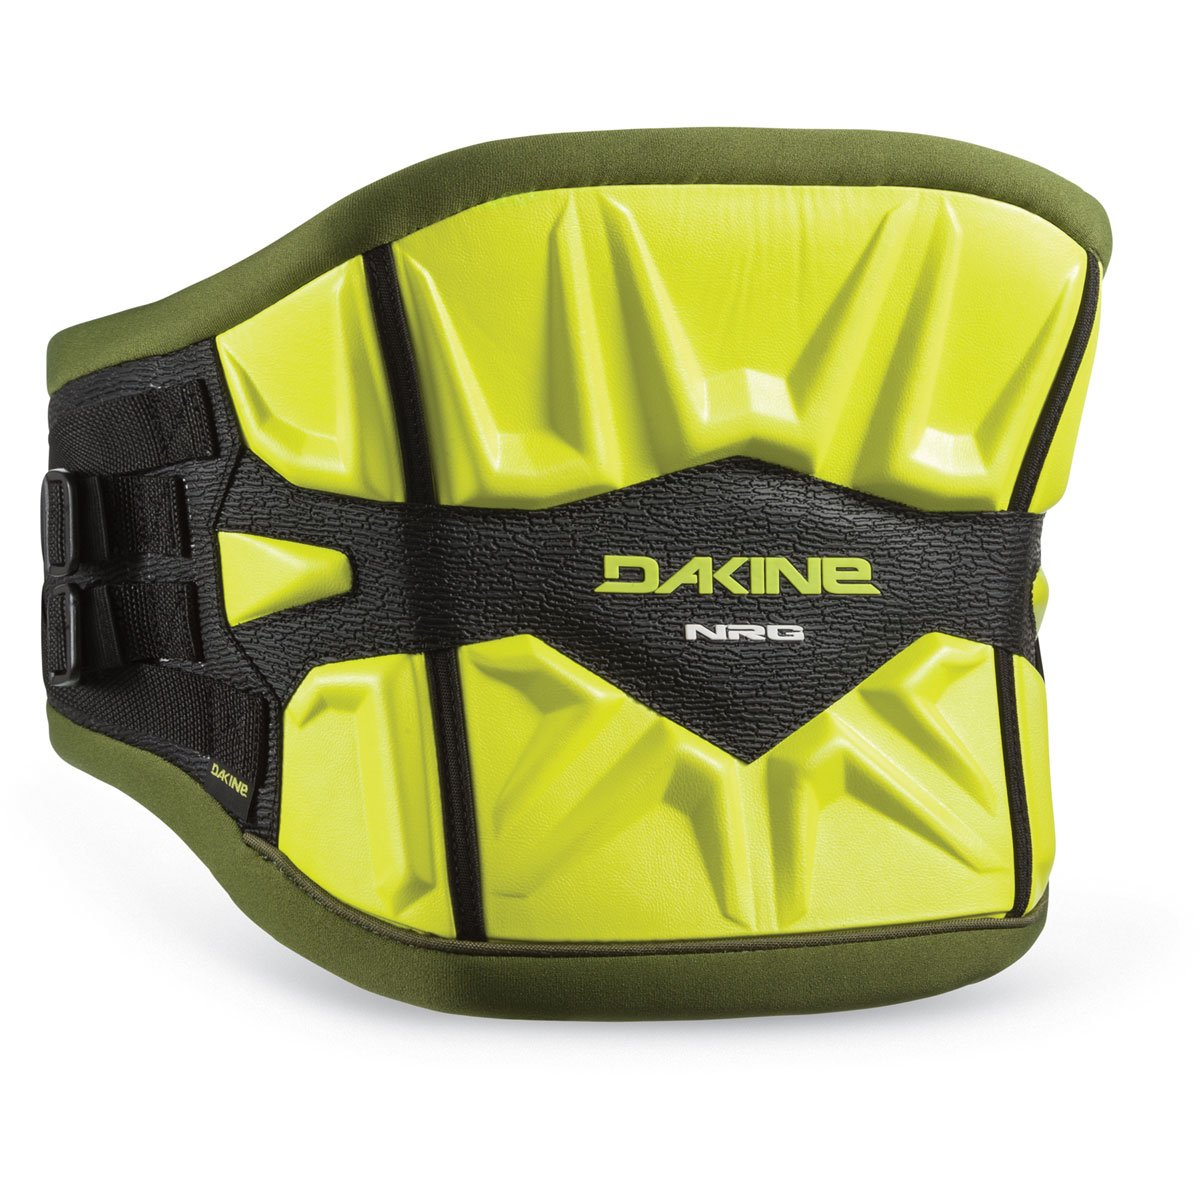 Dakine Men's Hybrid NRG Windsurf Harness, Sulphur, S by Dakine